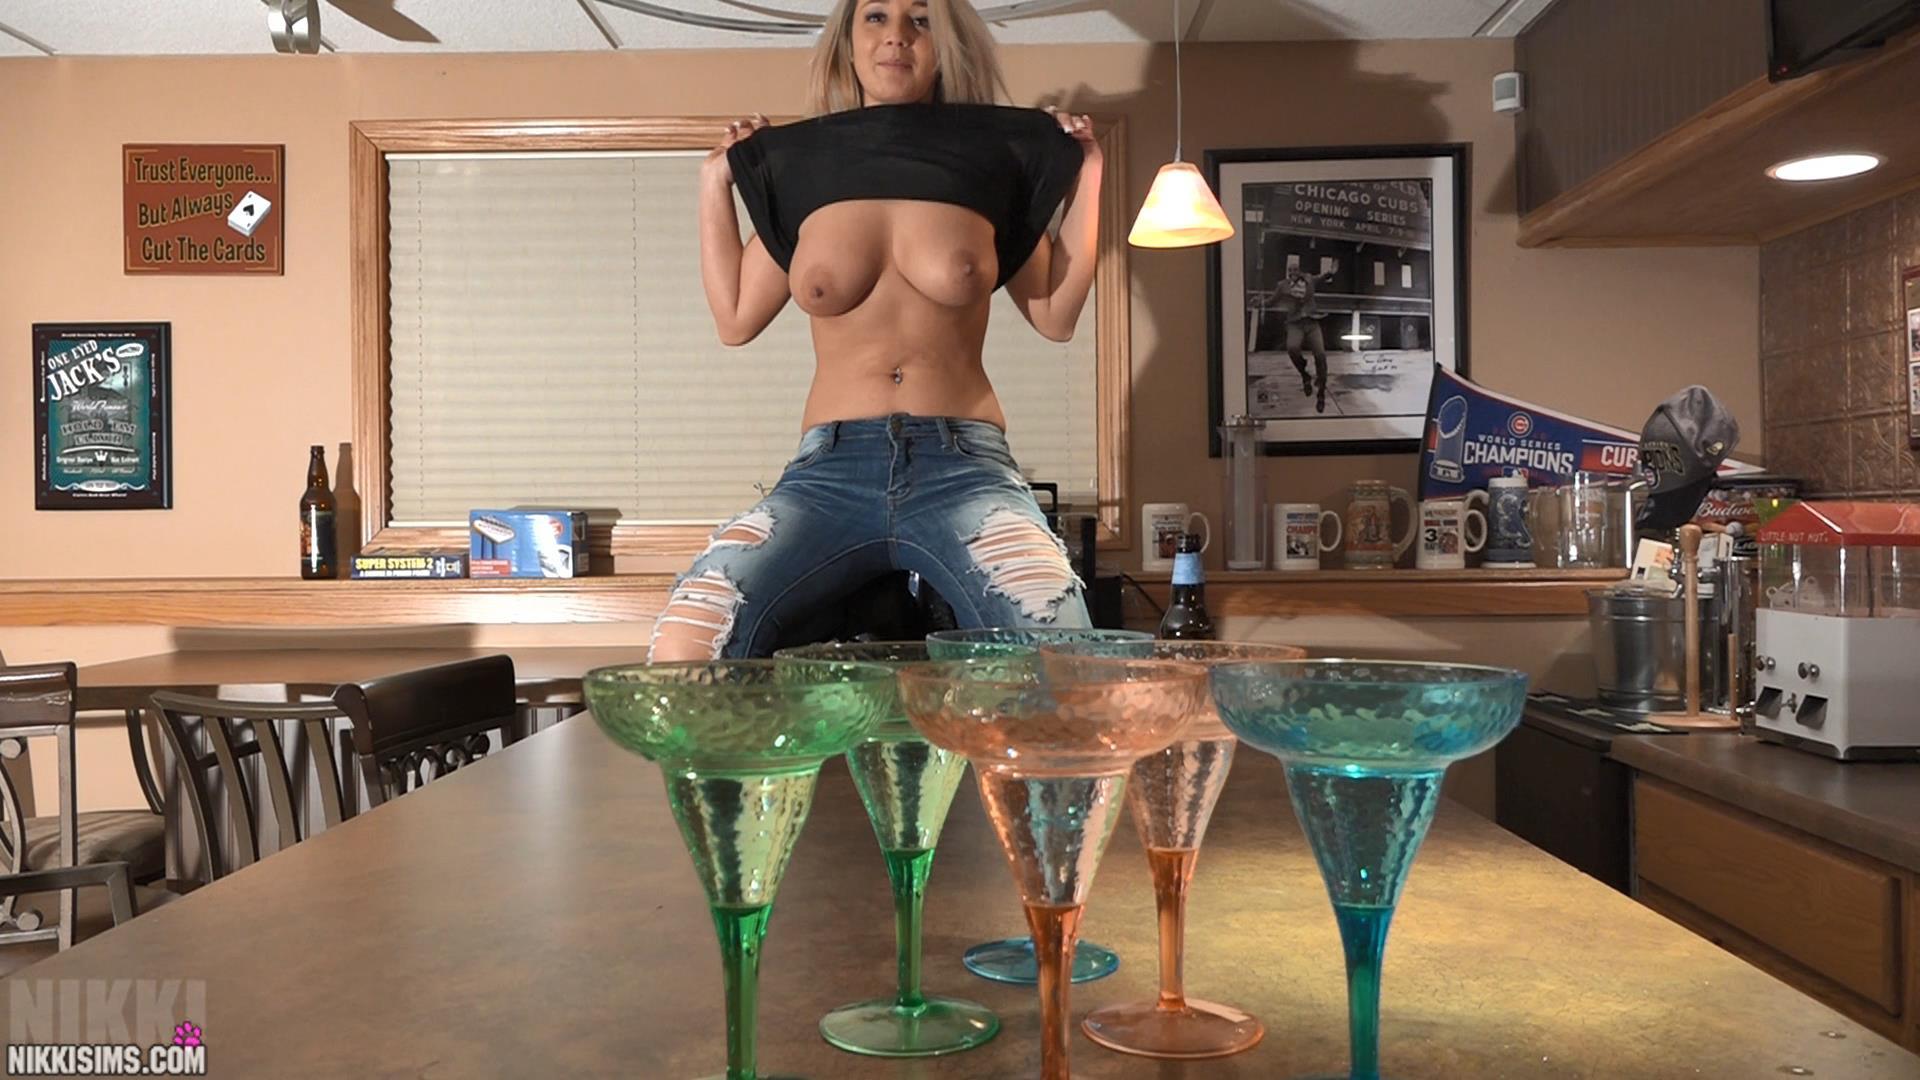 nikki sims topless beer pong / hotty stop